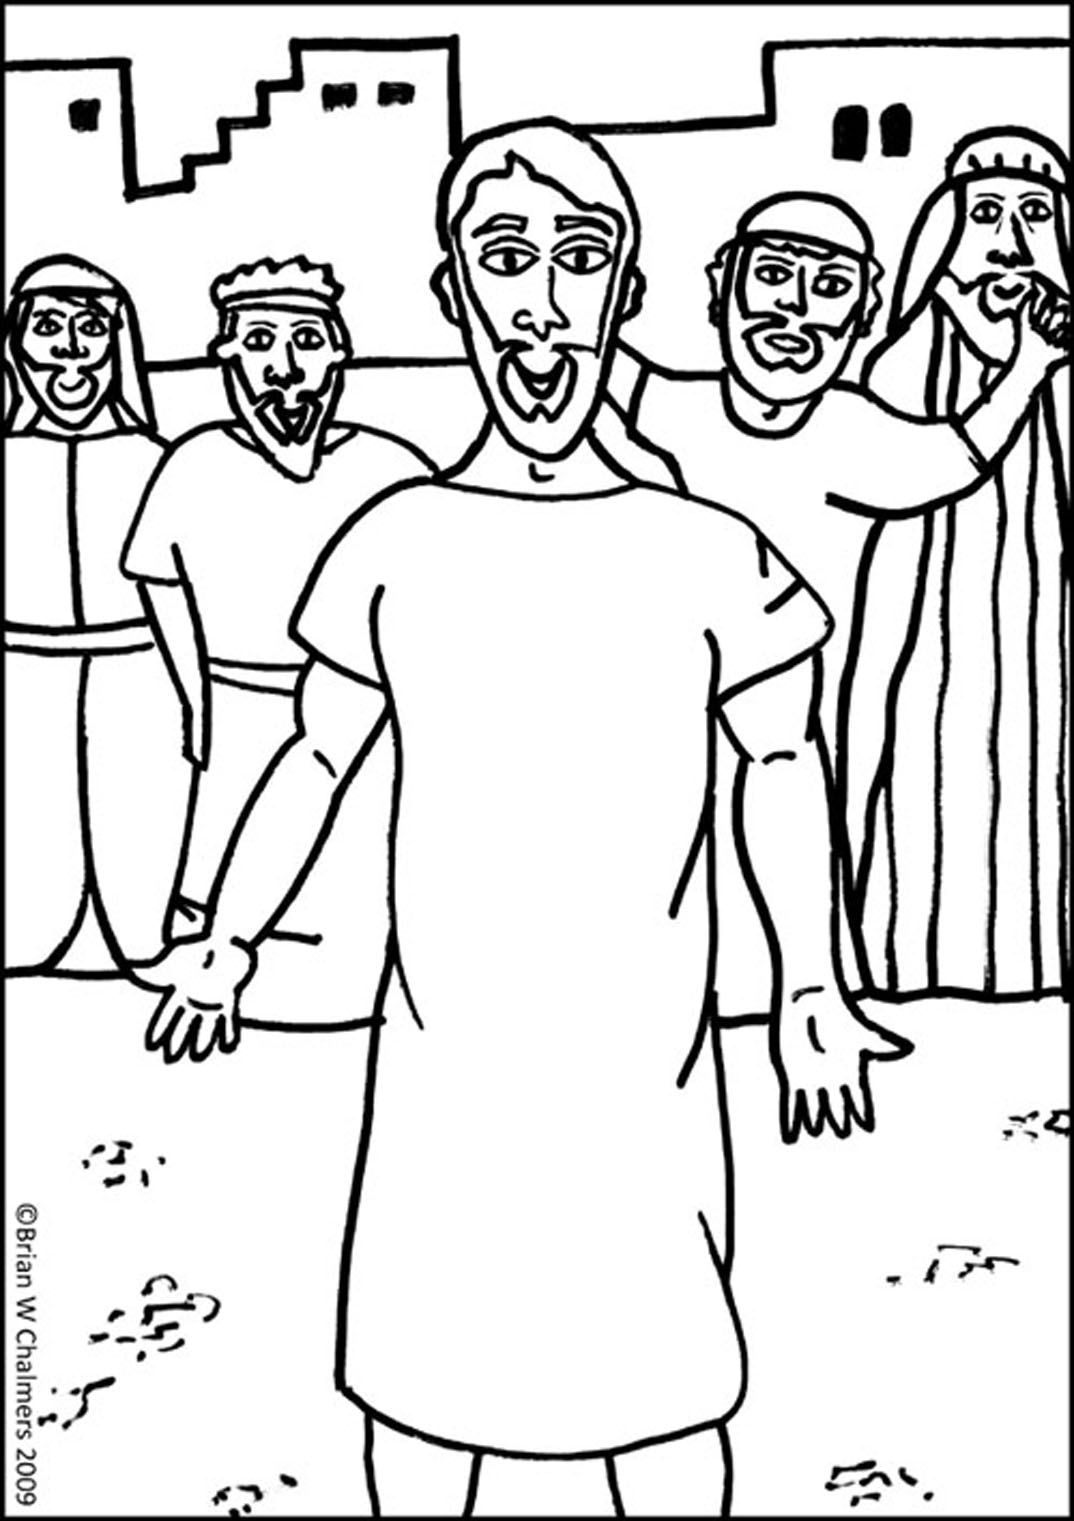 Jesus heals paralyzed man man crafts bible crafts school template vacation bible